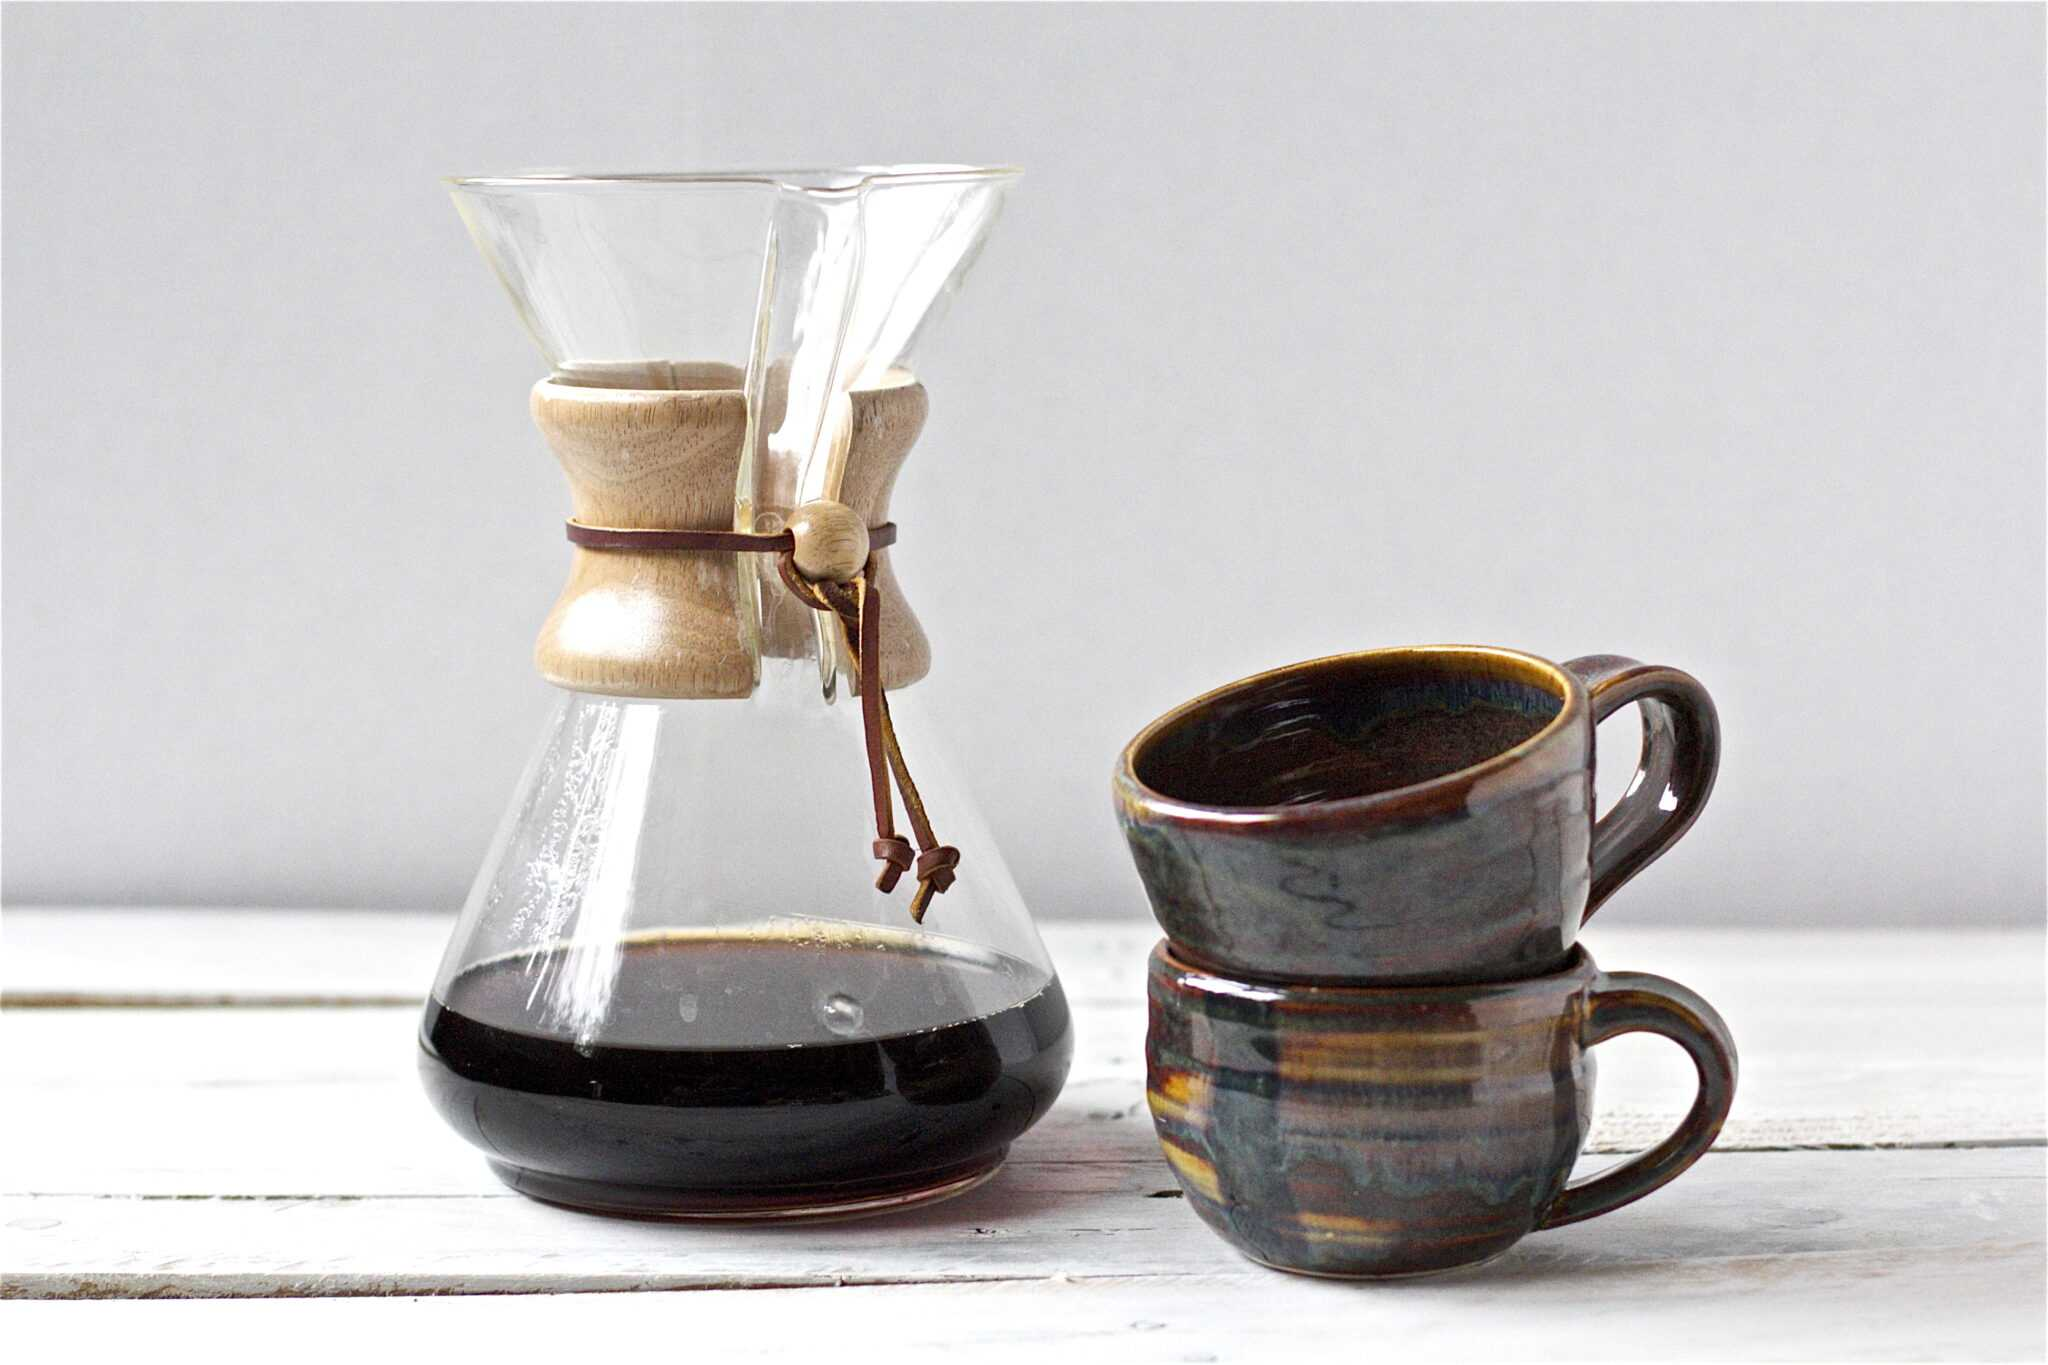 Кофе. Любовь. Альтернатива.